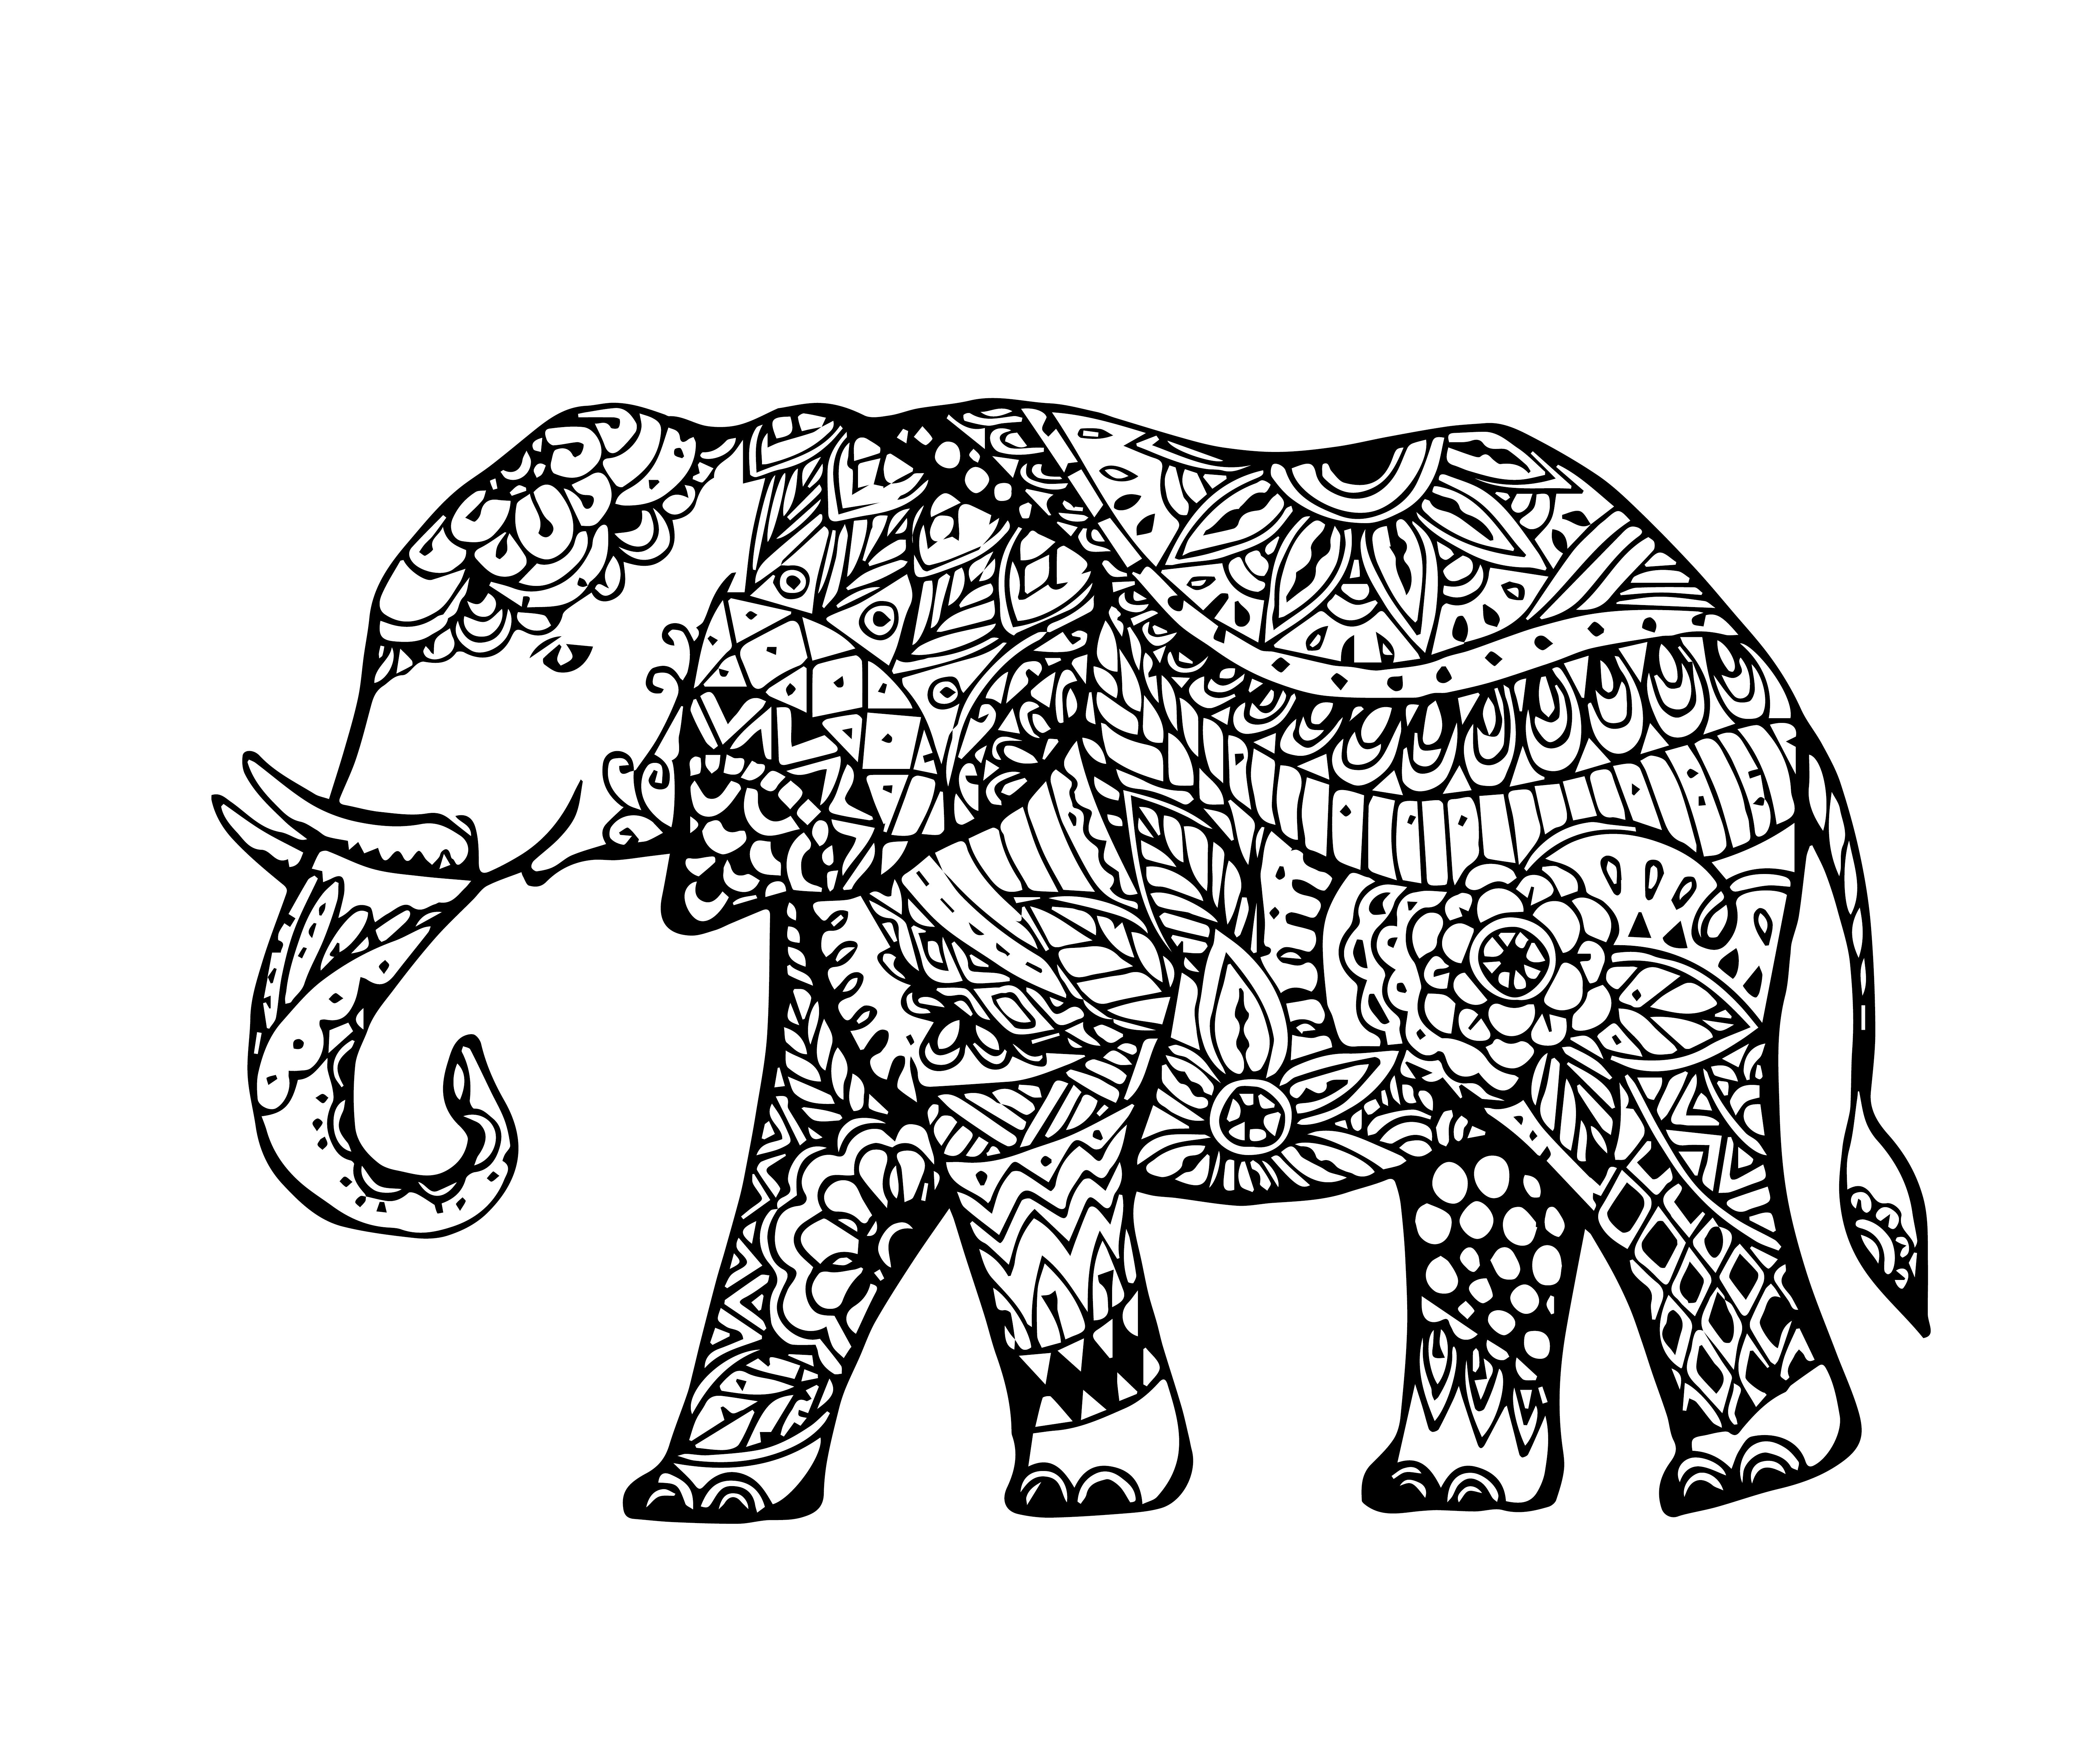 Dibujo Elefante Para Colorear E Imprimir: Los Mejores Mandalas De Elefantes